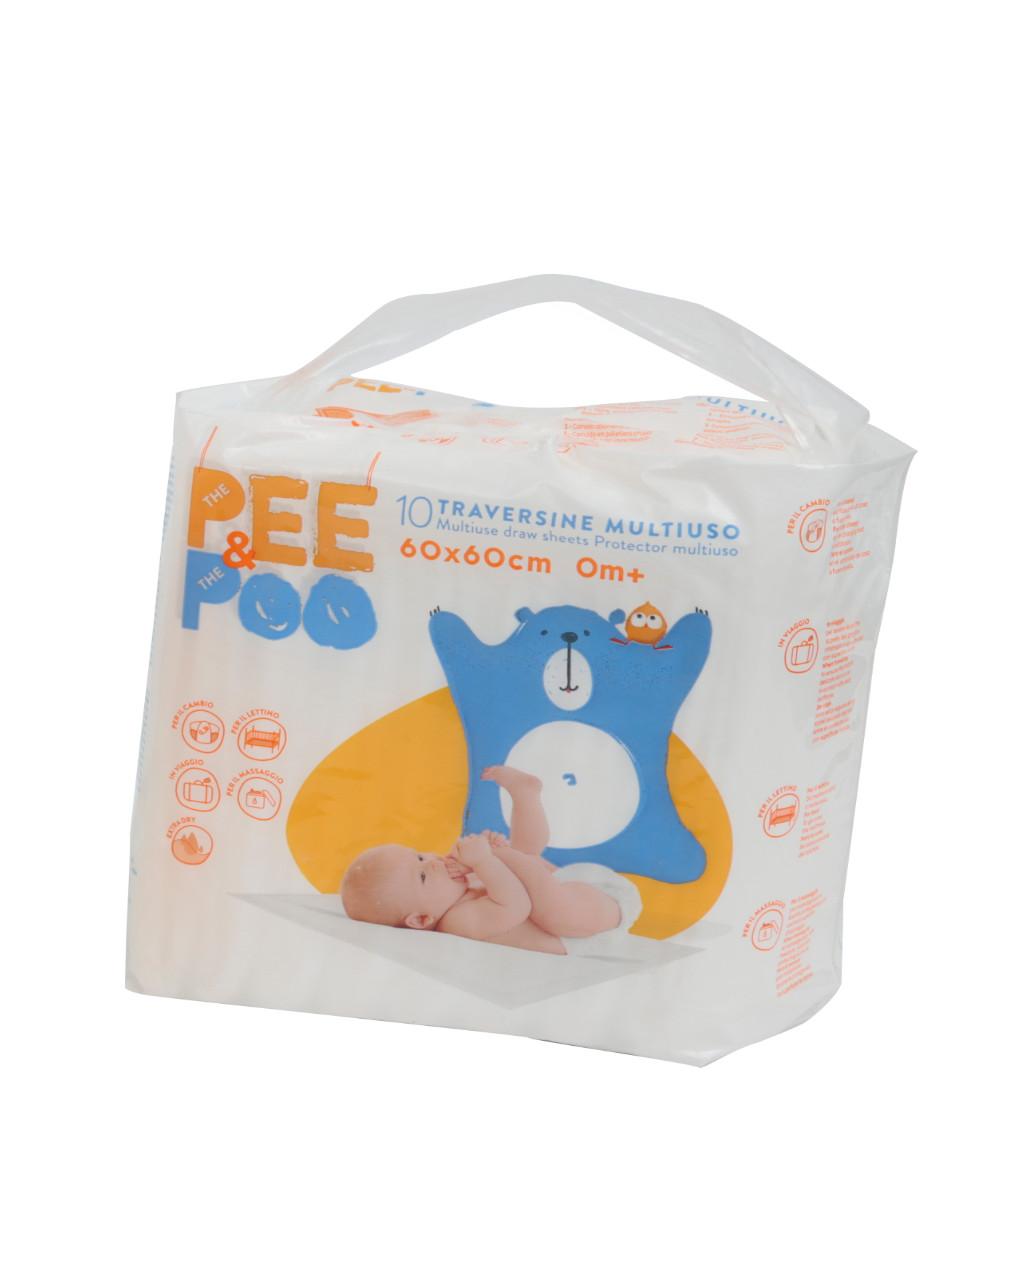 O xixi e o cocô traversina 60x60 - The Pee & The Poo